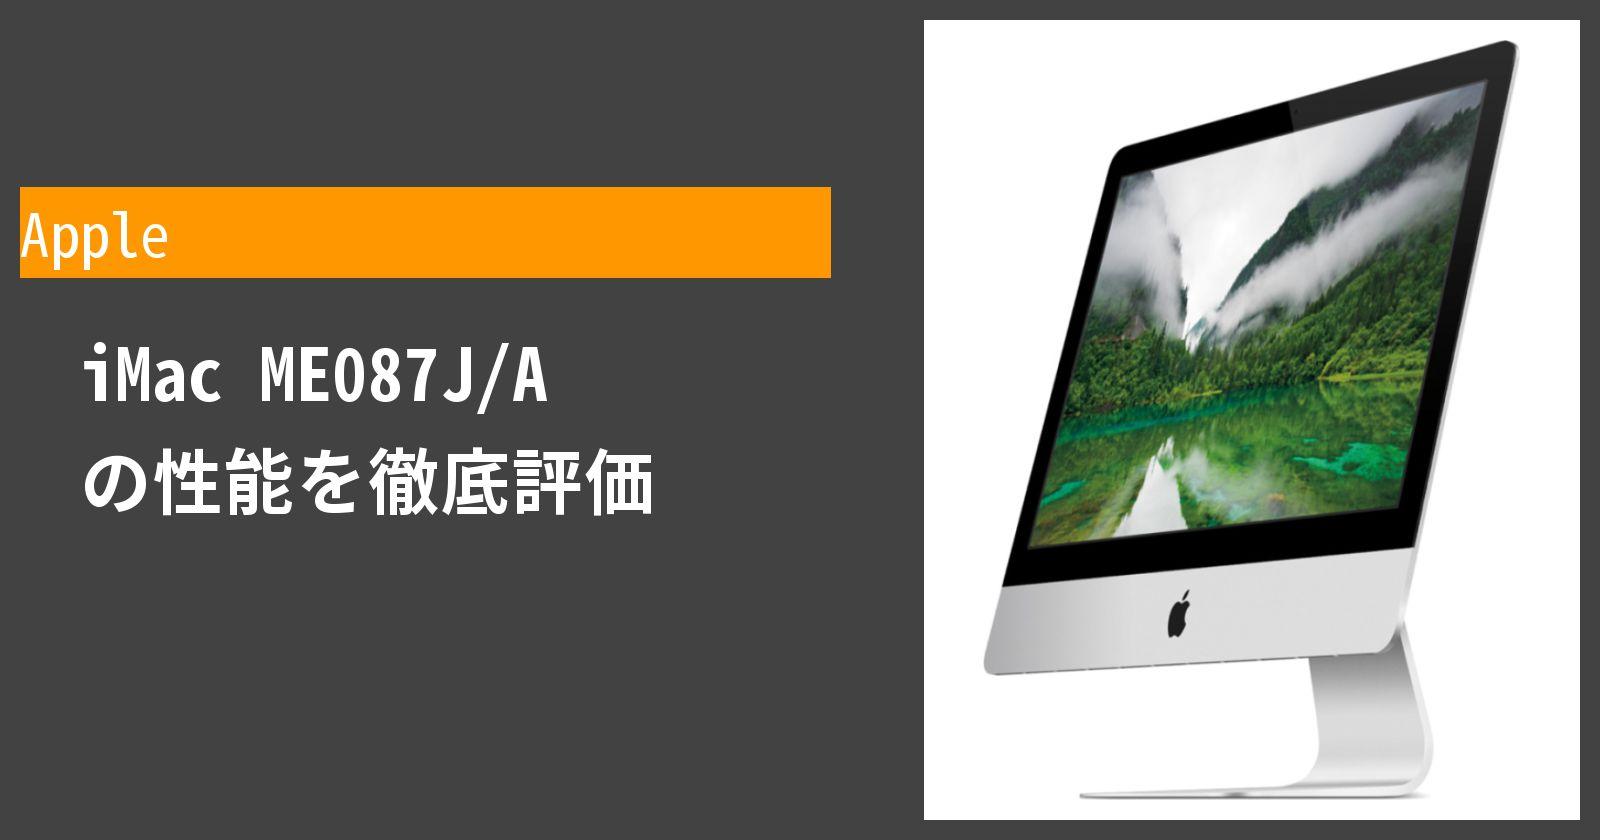 iMac ME087J/A の性能を徹底評価